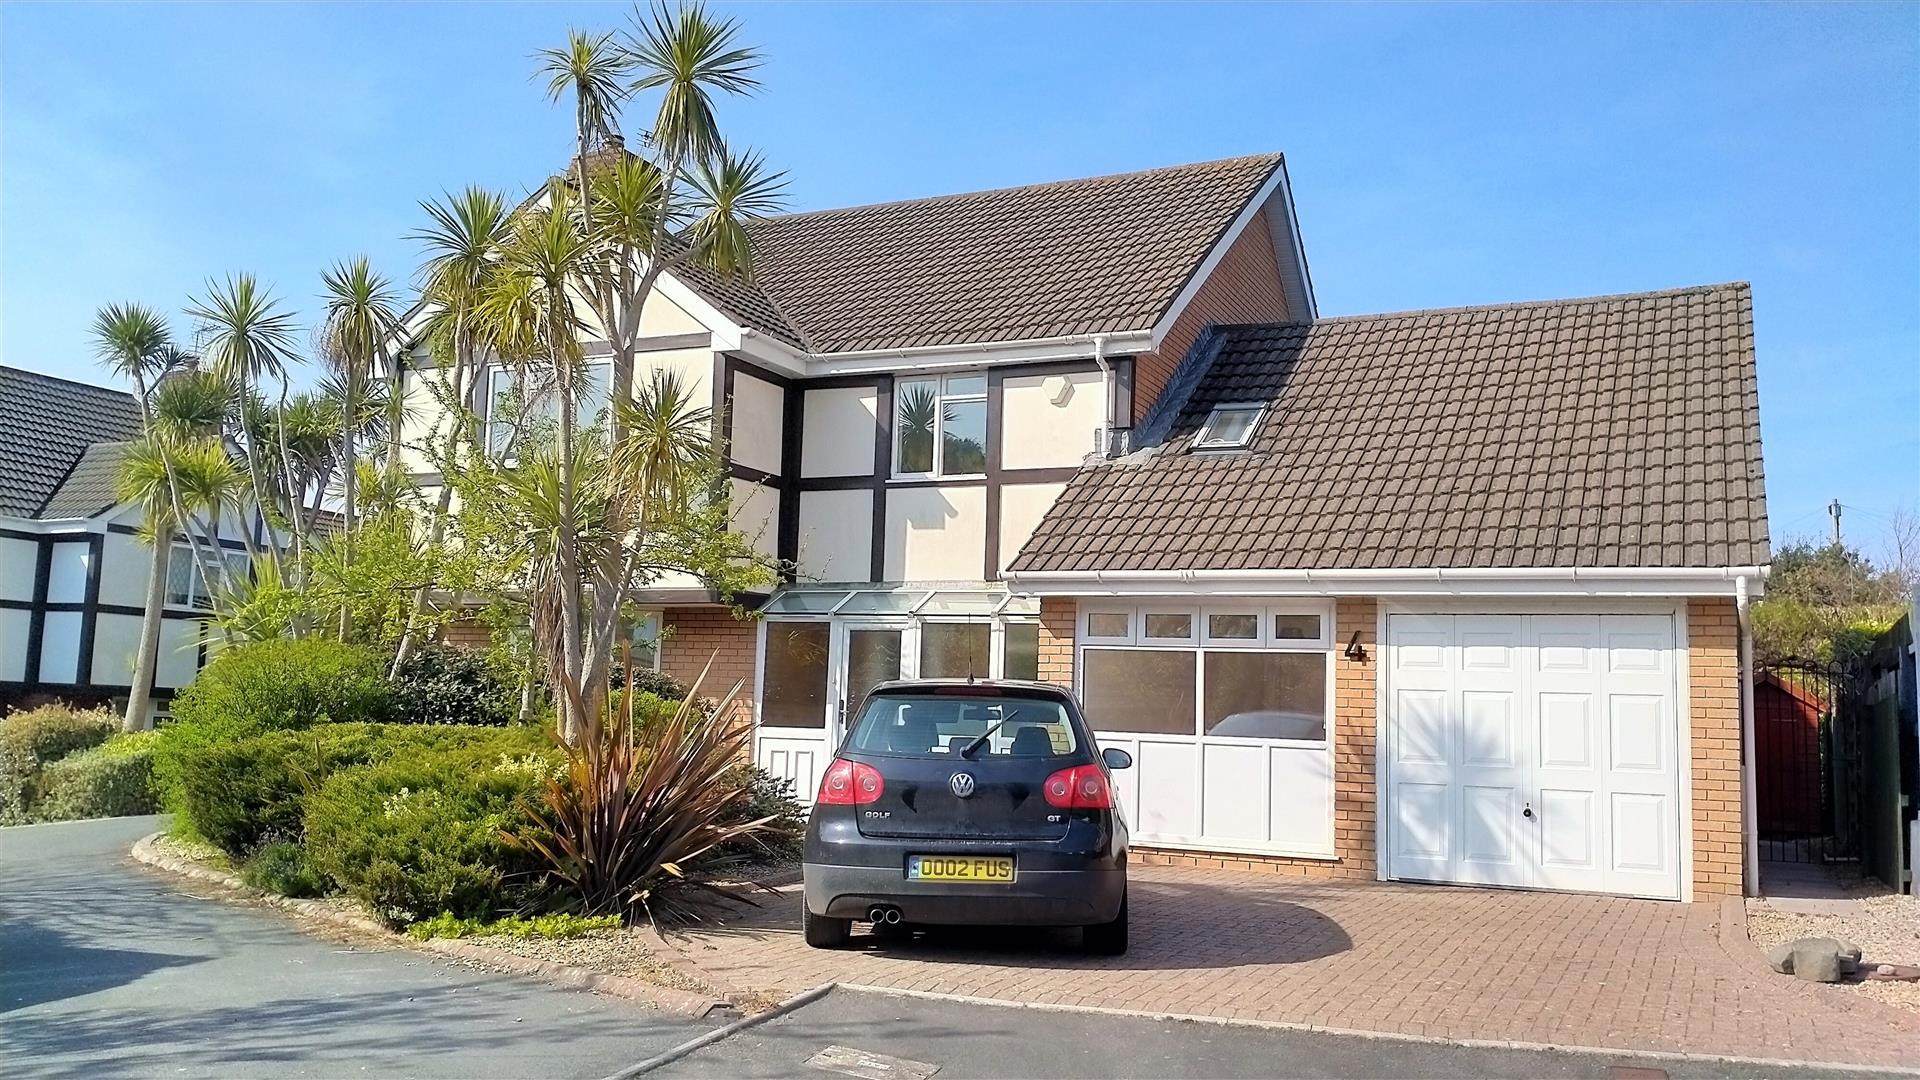 Nicholl Court, Limeslade, Swansea, SA3 4LZ